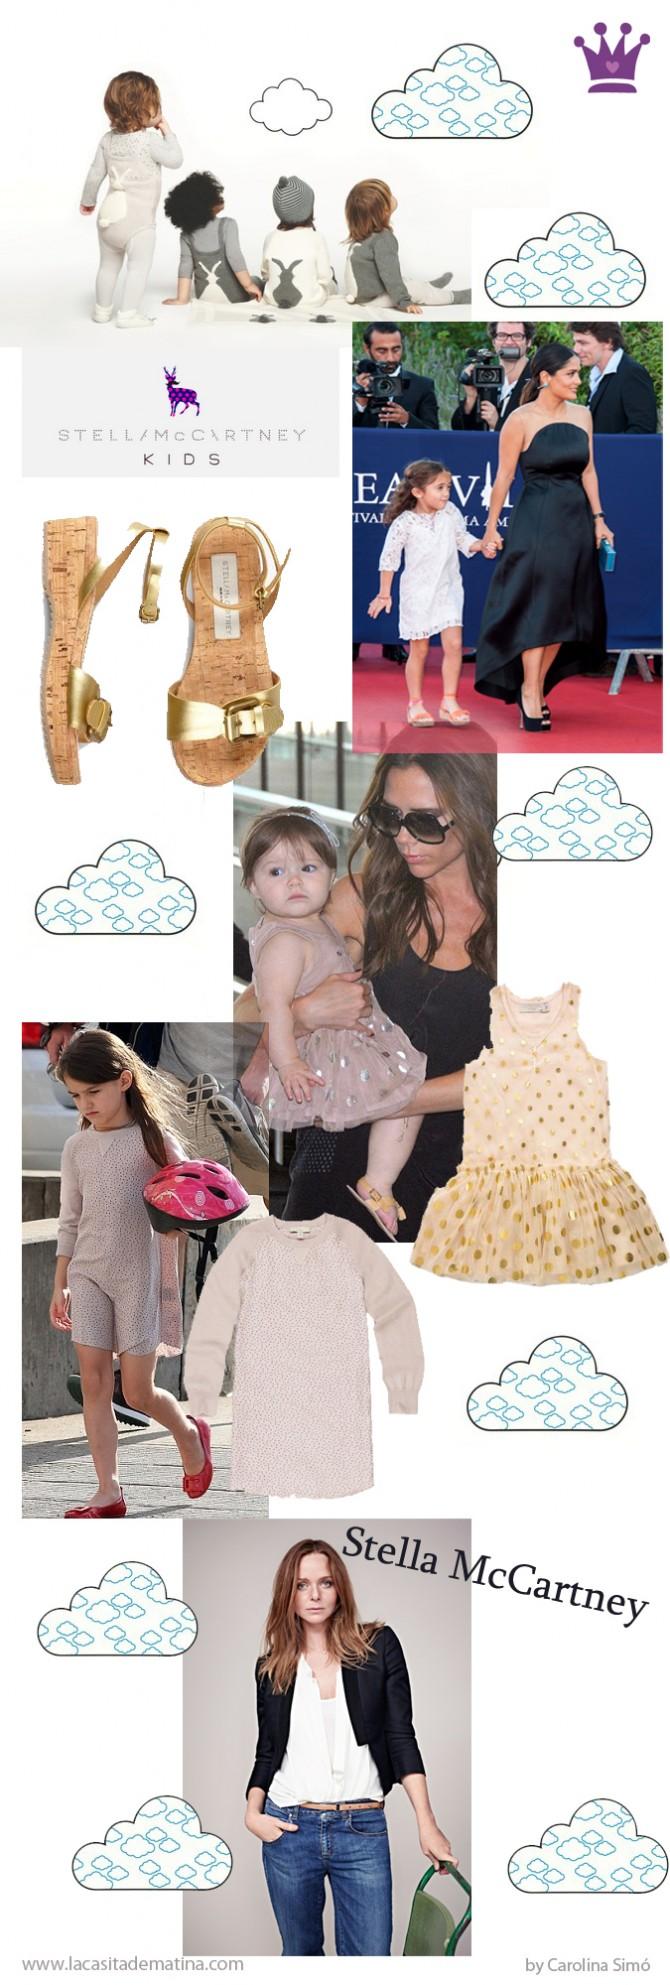 Stella McCartney, Premio Telva mejor diseñador internacional 2012, Blog de Moda Infantil, Suri Cruise, Harper Seven